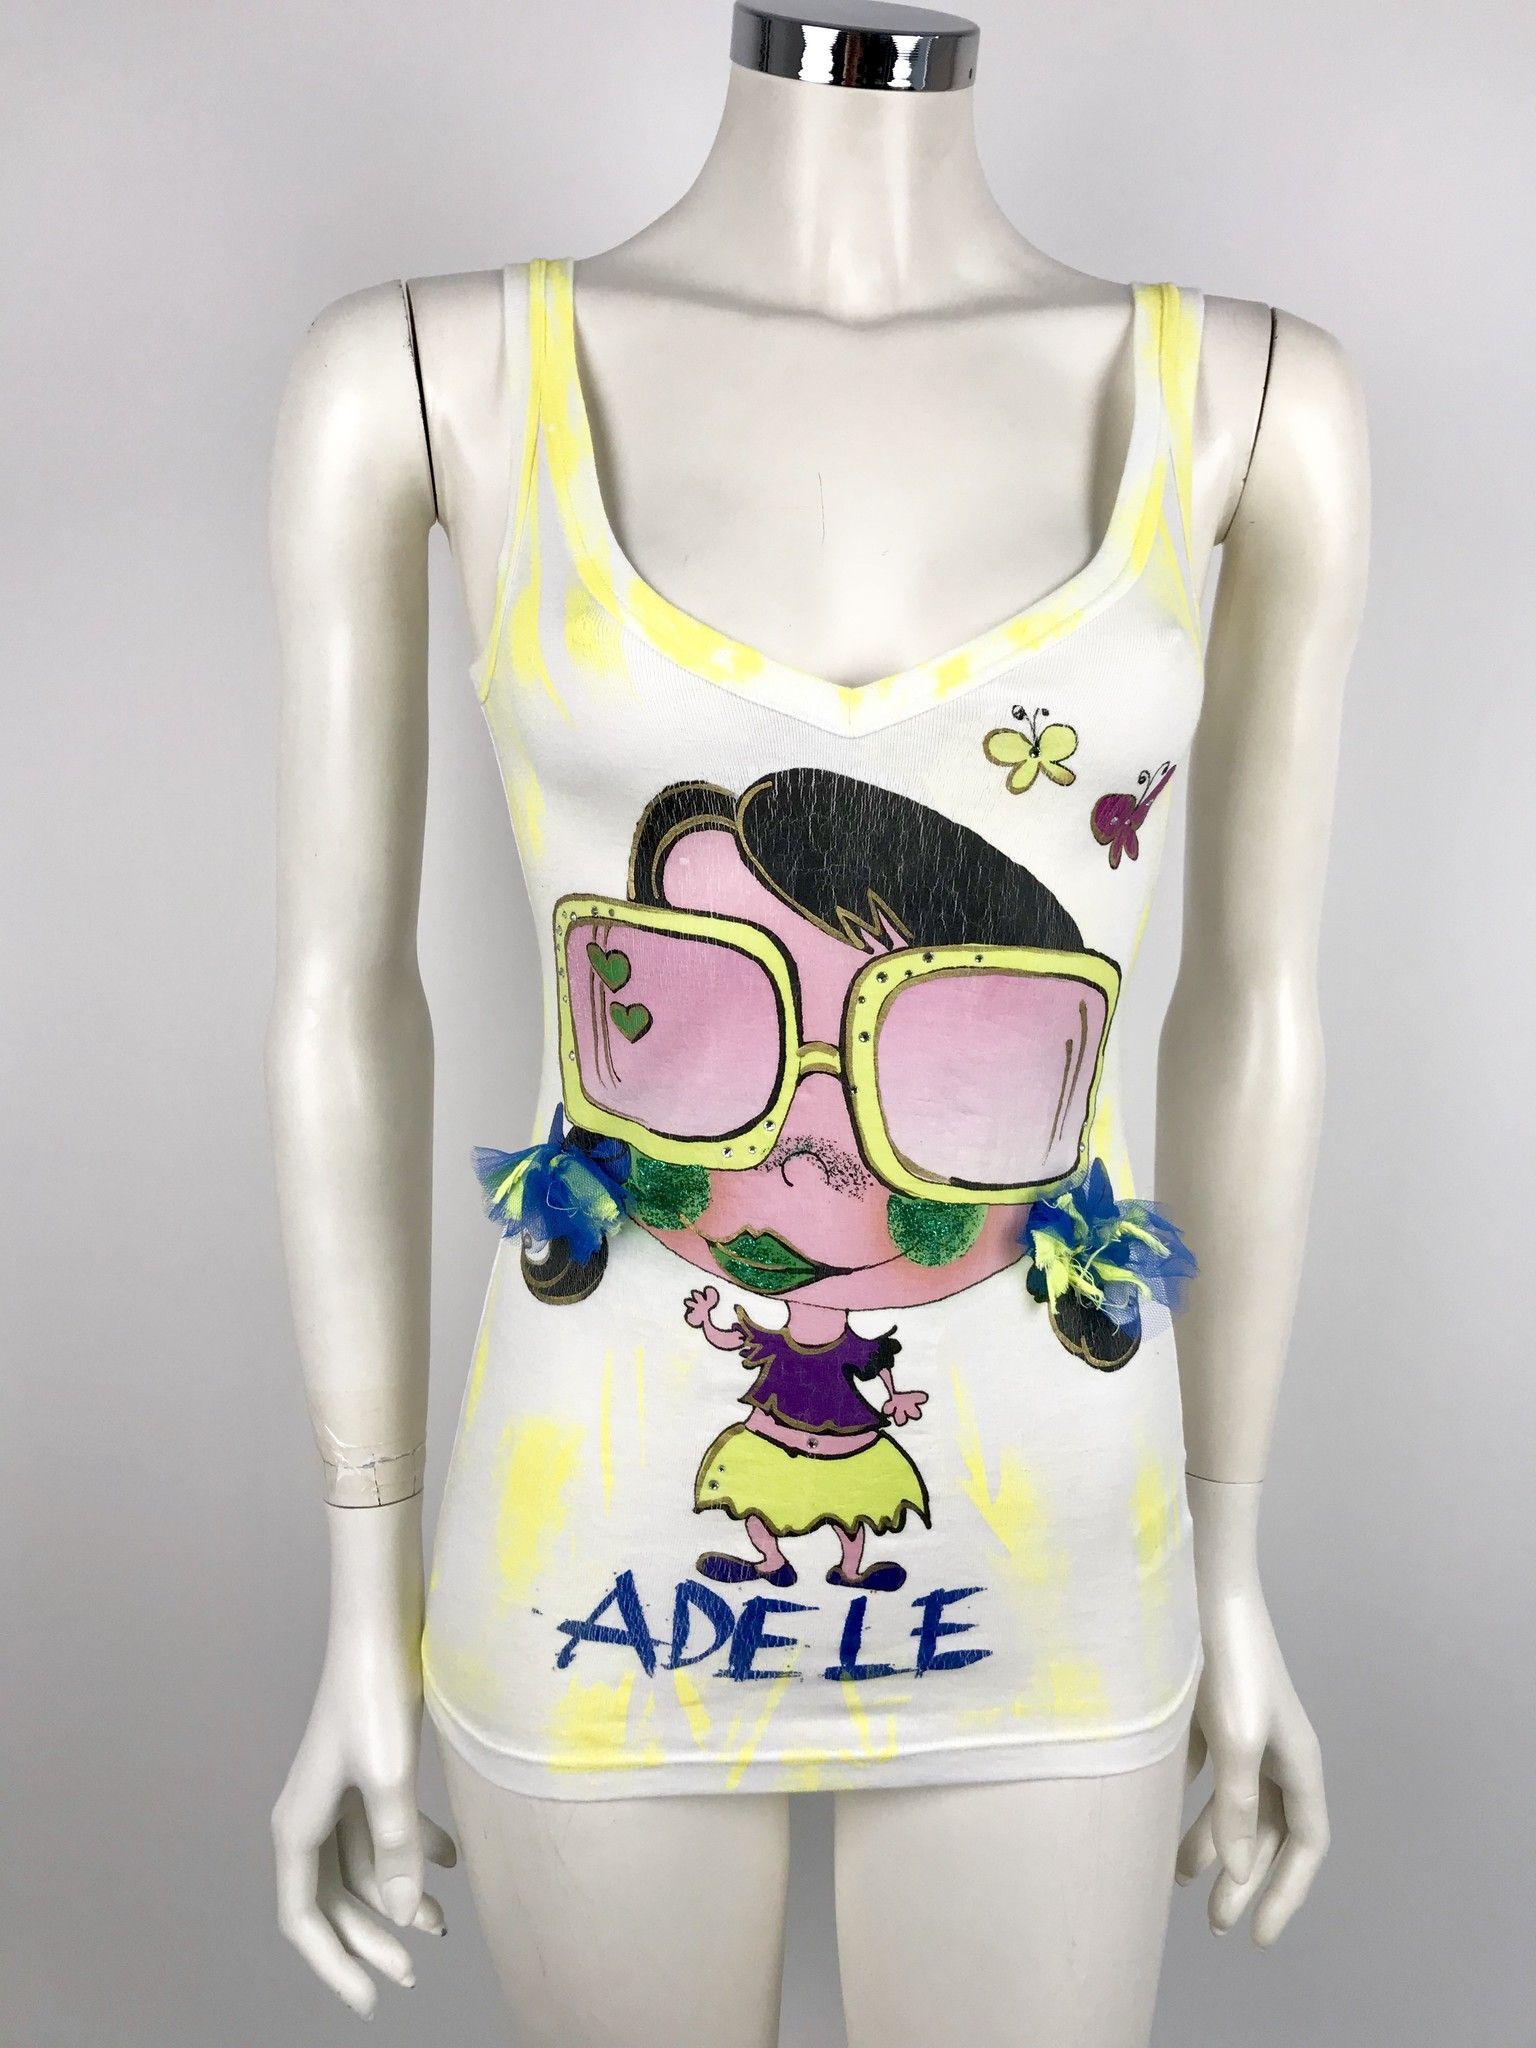 Adele Fado Face Print Tank Top Cod.C521